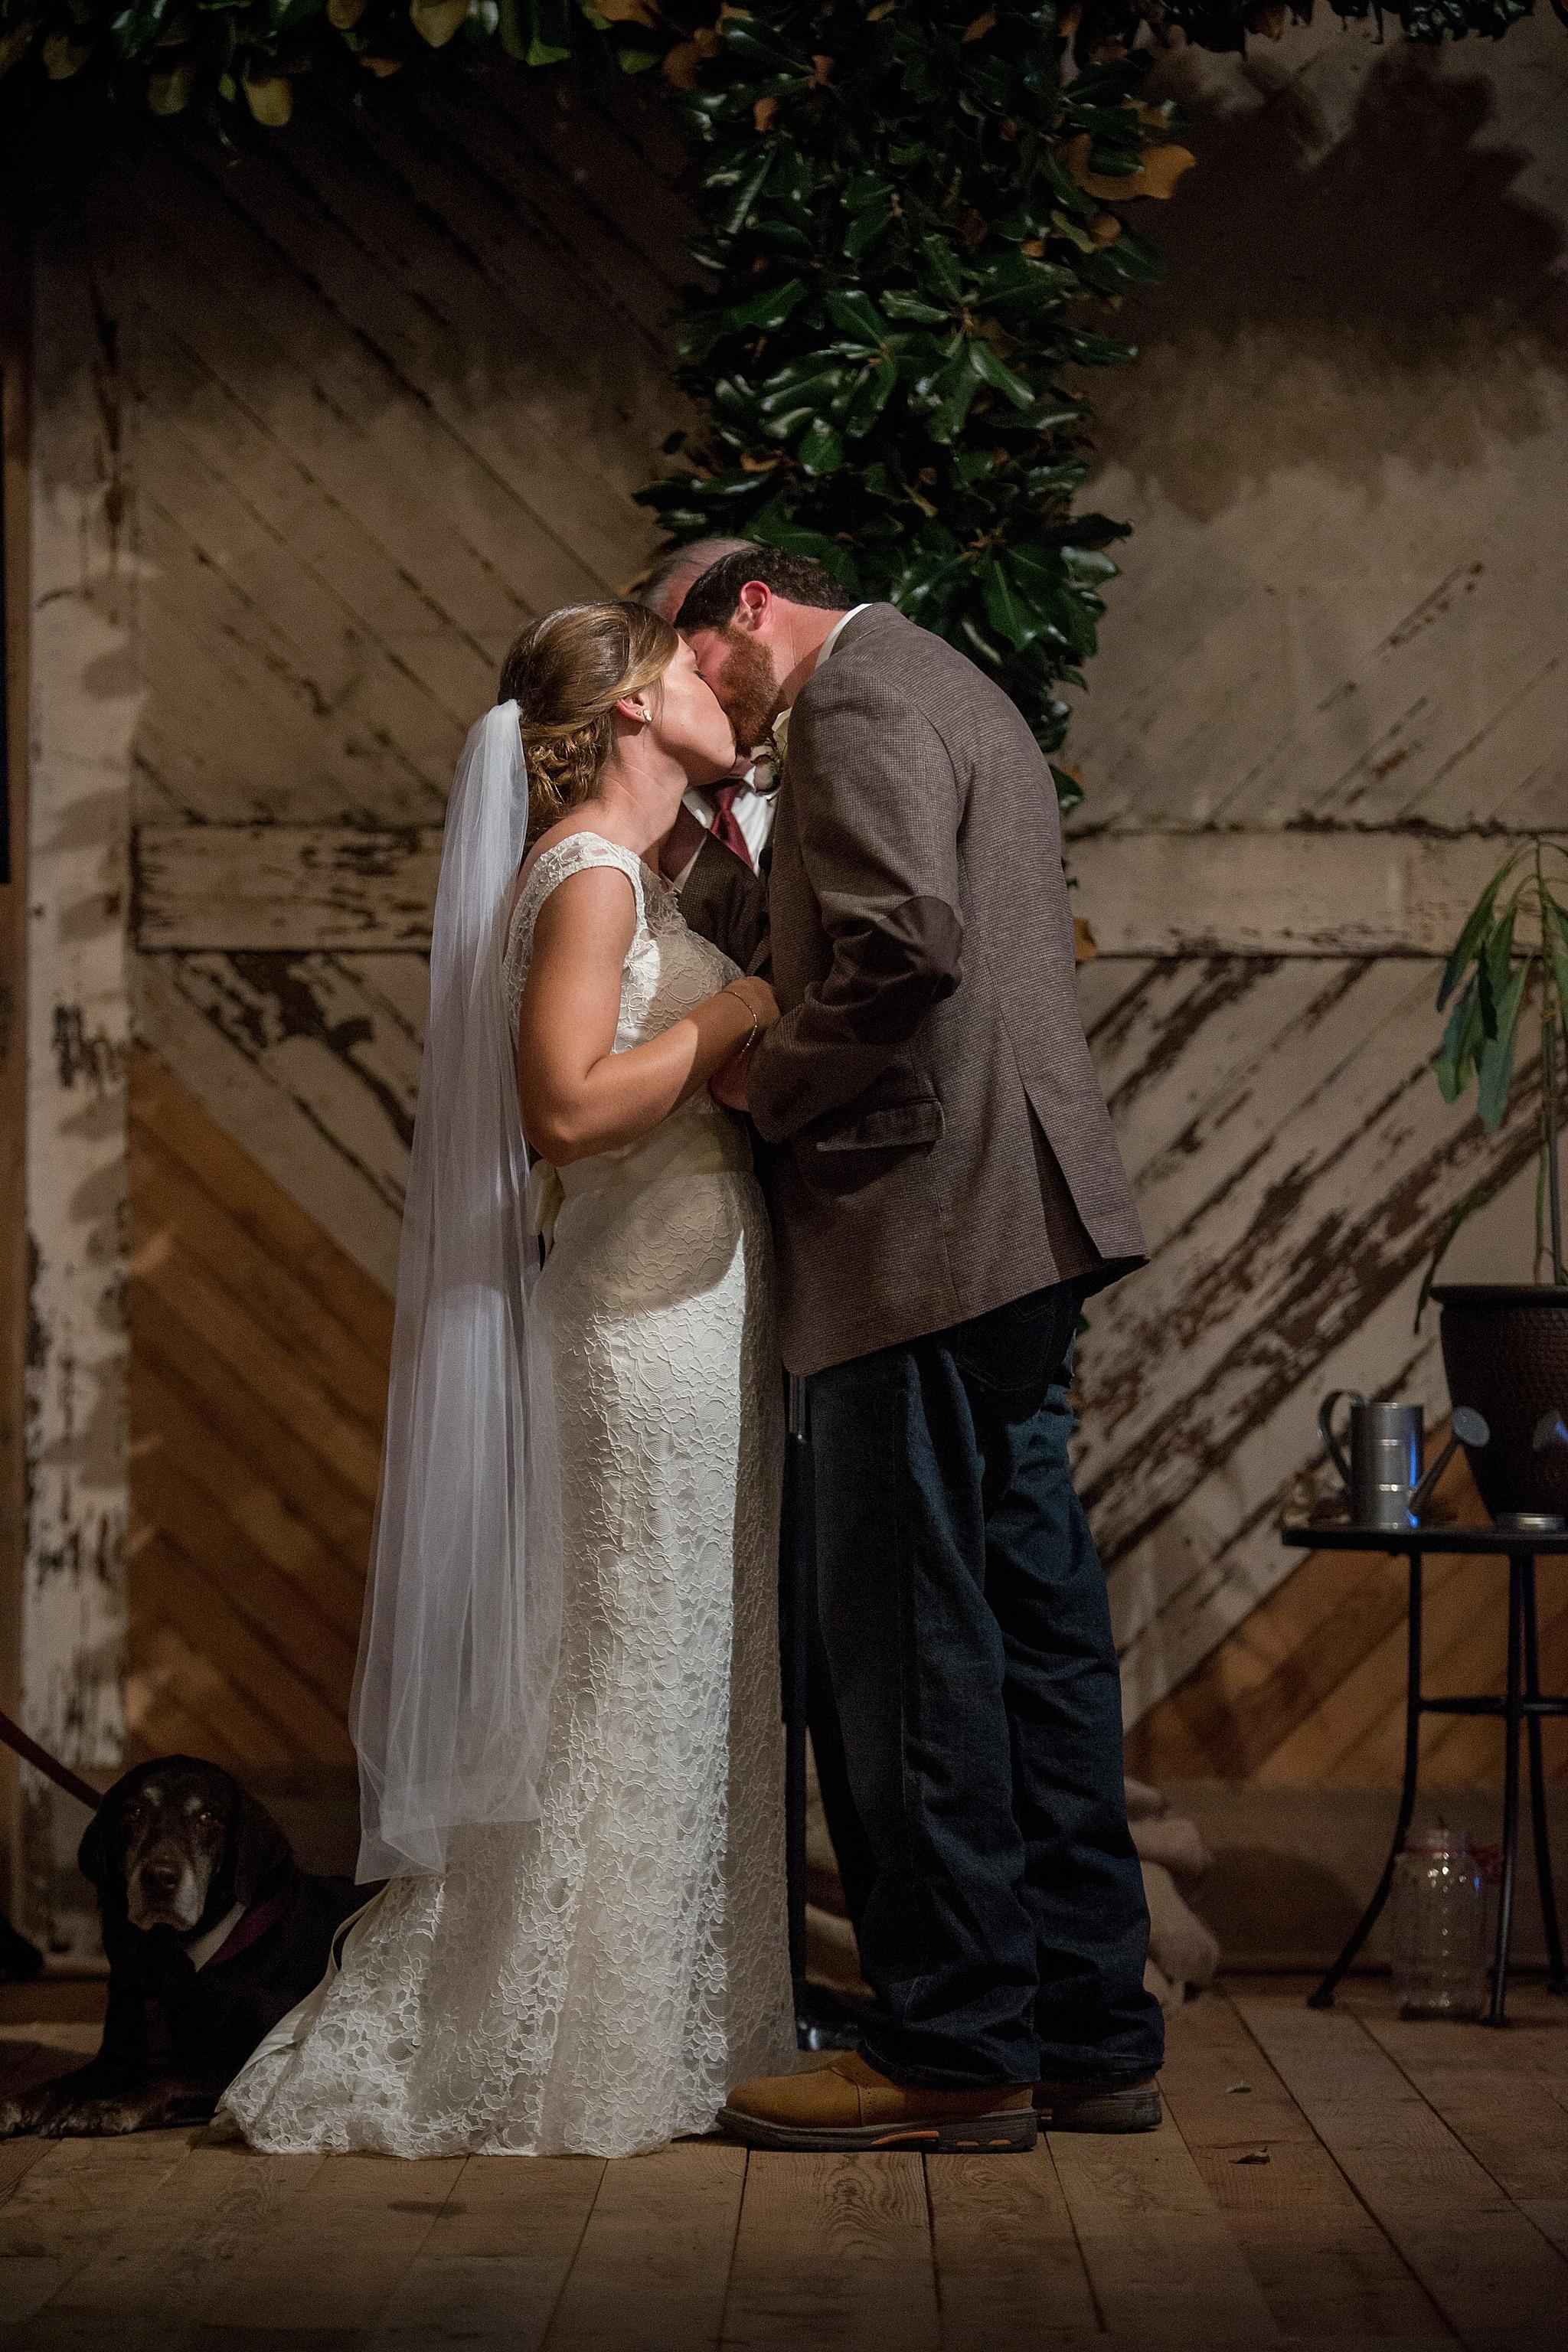 May-Lew-Farm-Farmville-NC-Wedding-Photographer-090.jpg